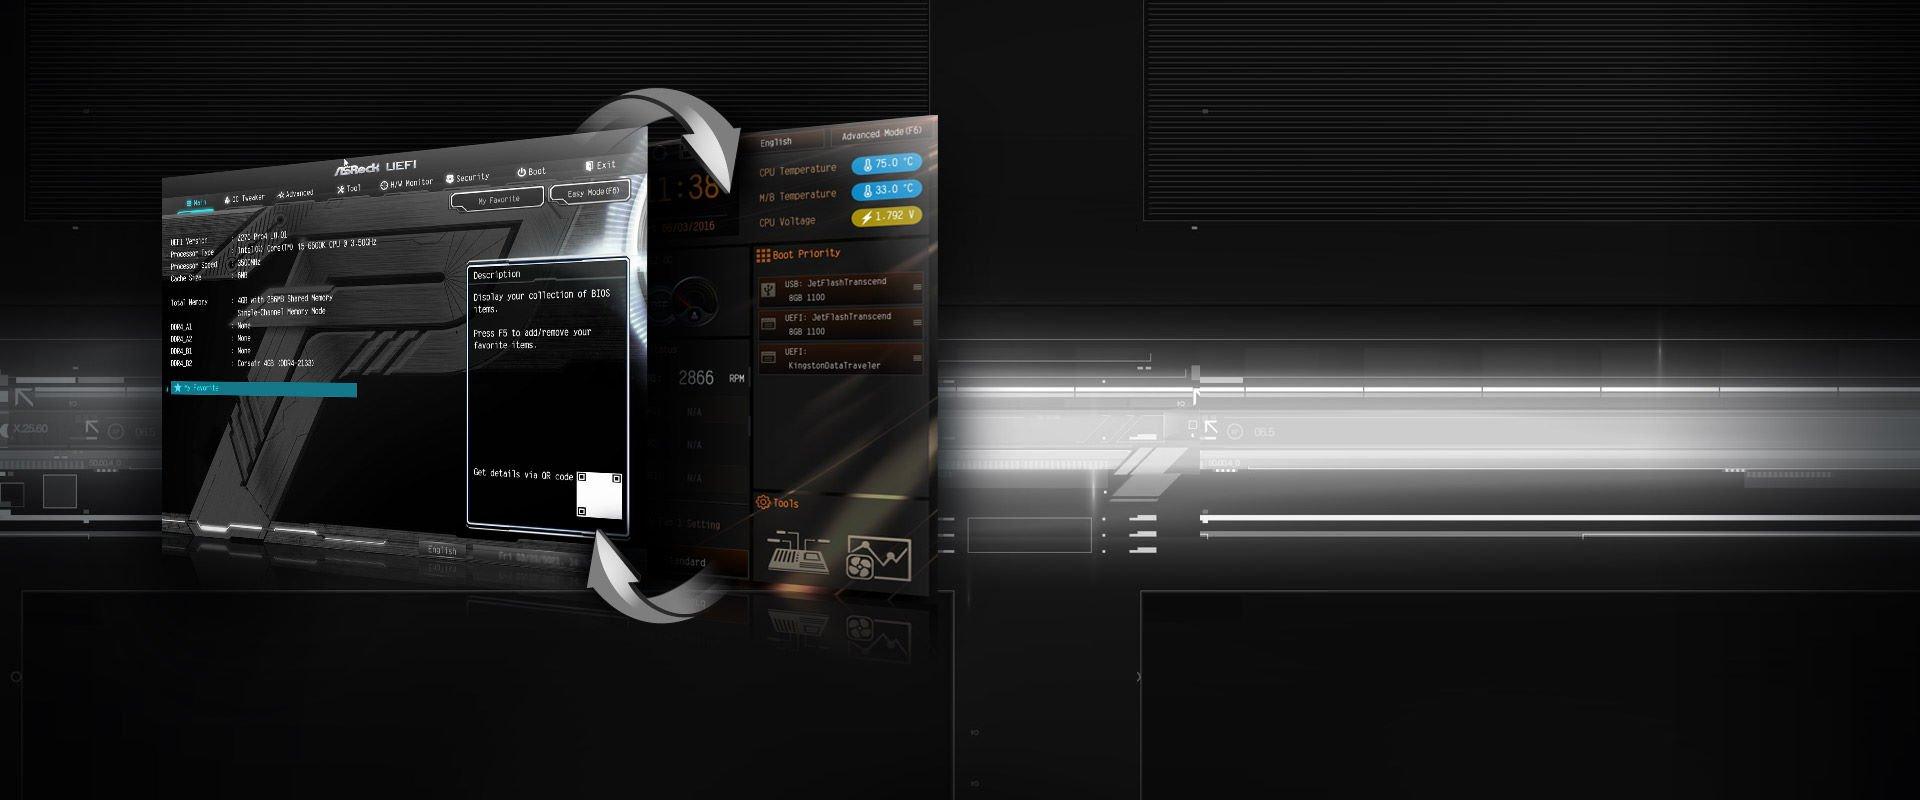 ASRock > B250M Pro4